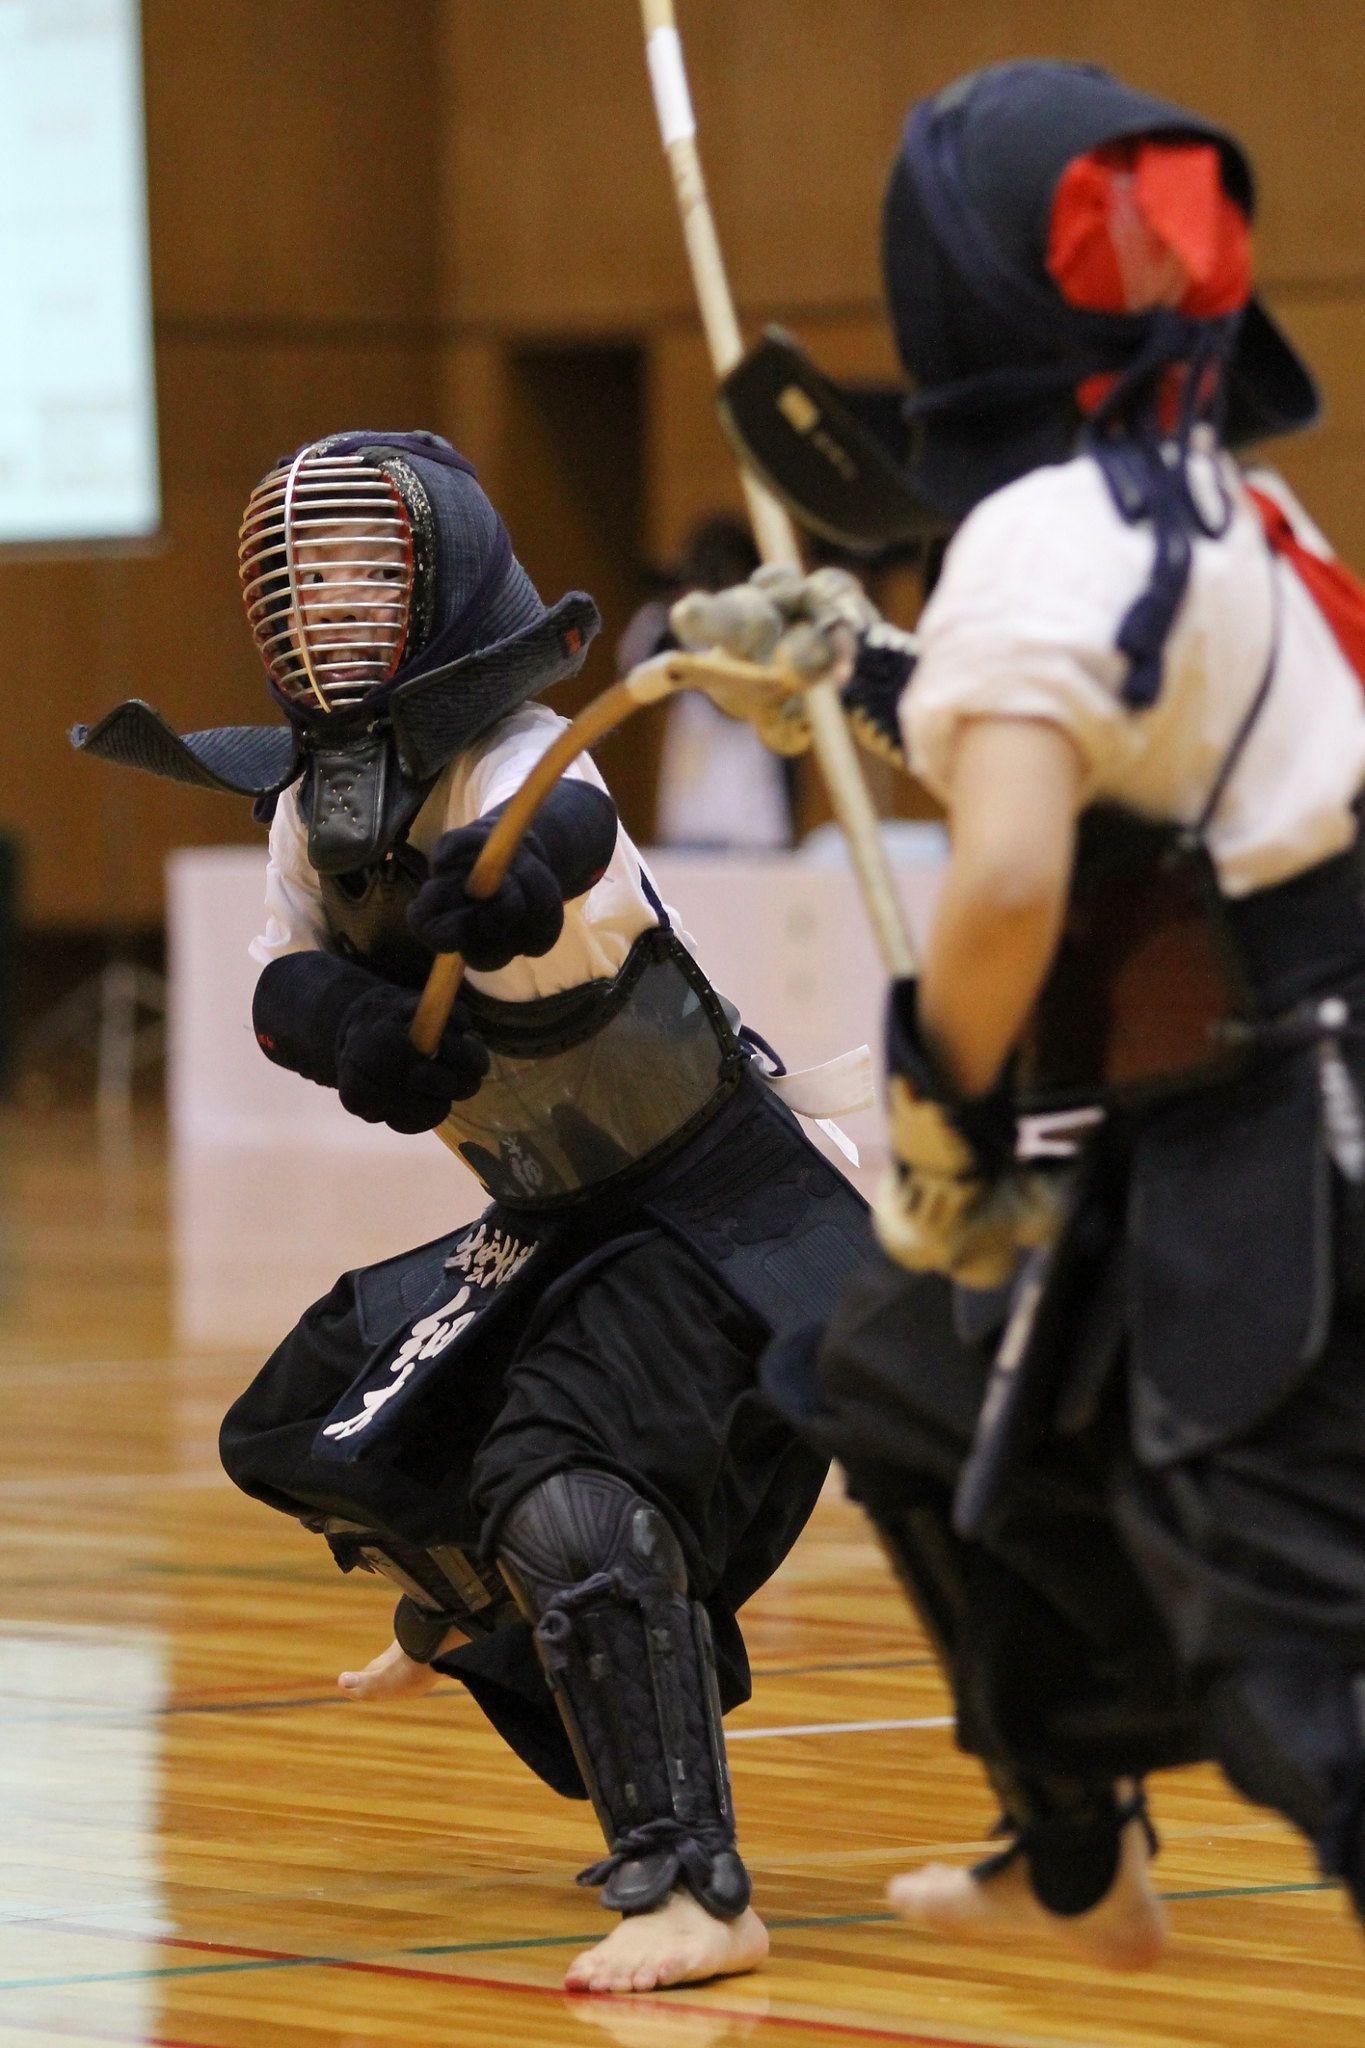 Attack martial arts women kendo martial arts